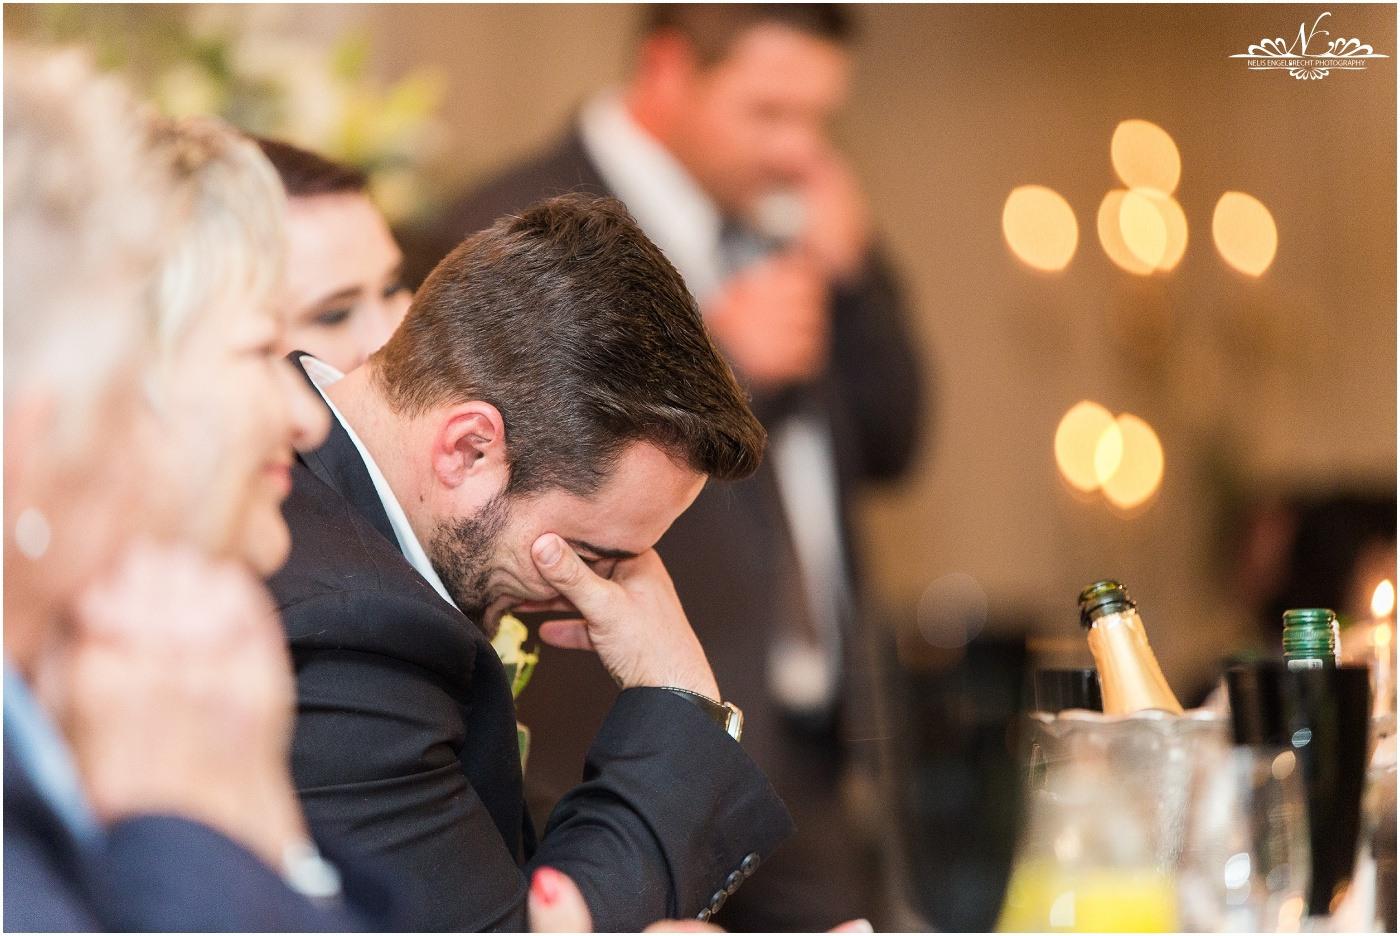 Eensgezind-Wedding-Photos-Nelis-Engelbrecht-Photography-185